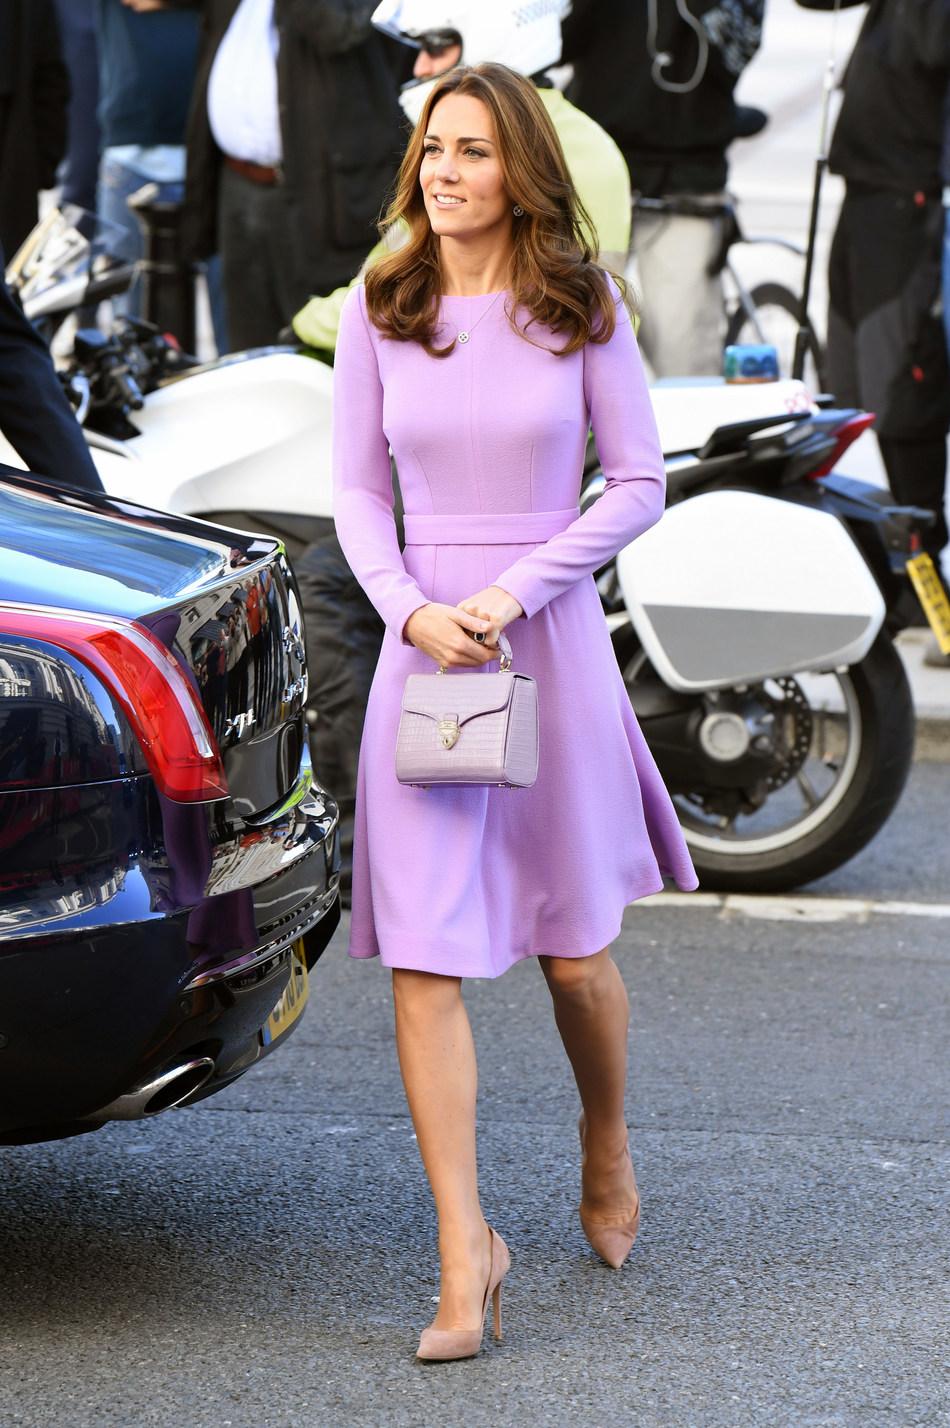 Duchess of Cambridge carrying Aspinal of London Midi Mayfair Bag.